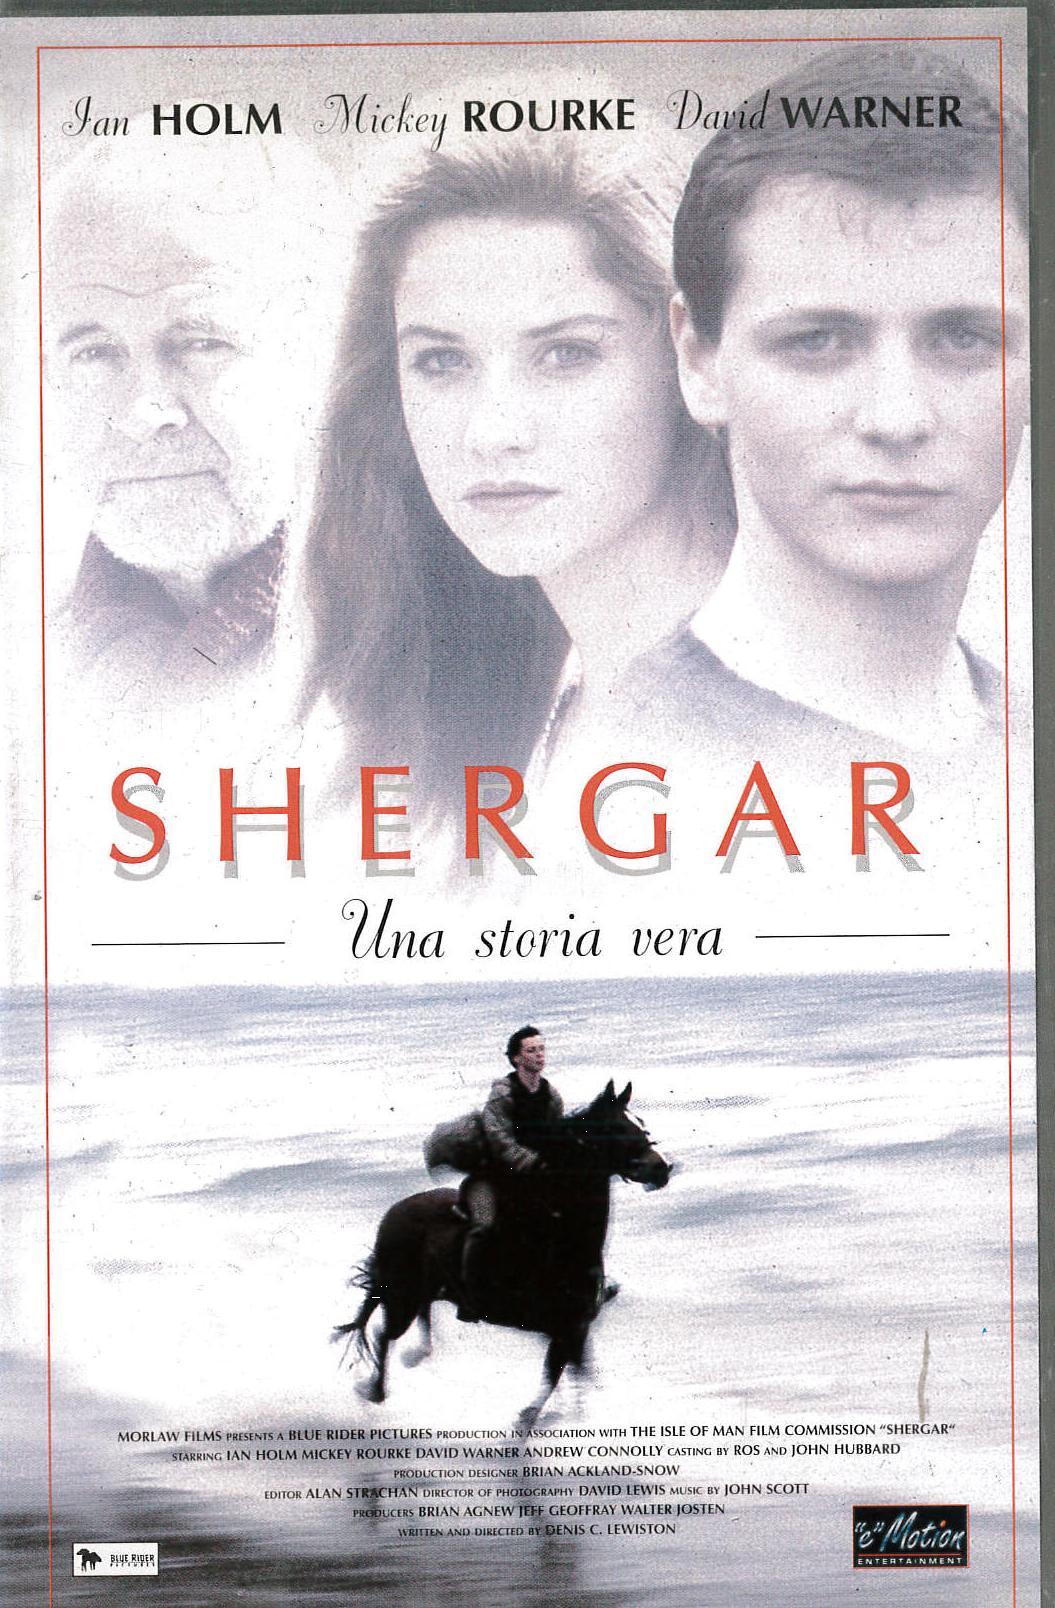 SHERGAR UNA STORIA VERA - VHS EX NOLEGGIO (VHS)